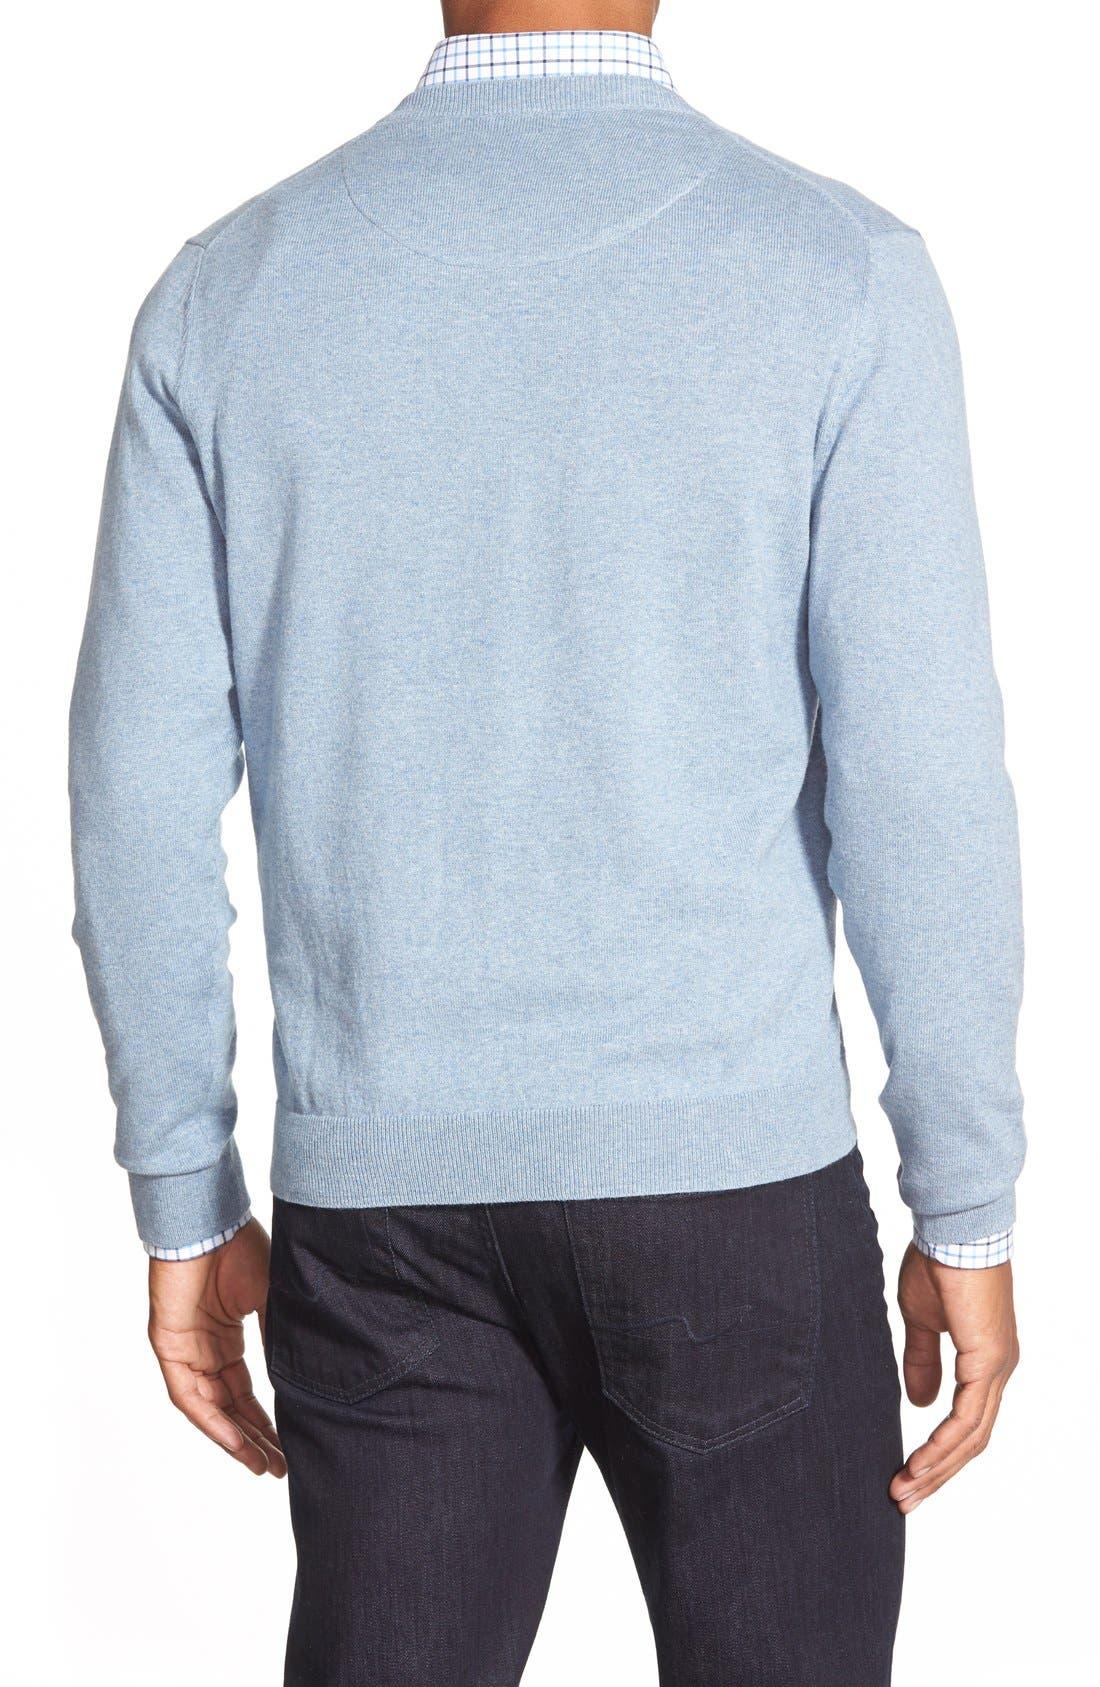 Cotton & Cashmere V-Neck Sweater,                             Alternate thumbnail 2, color,                             Blue Celestial Heather